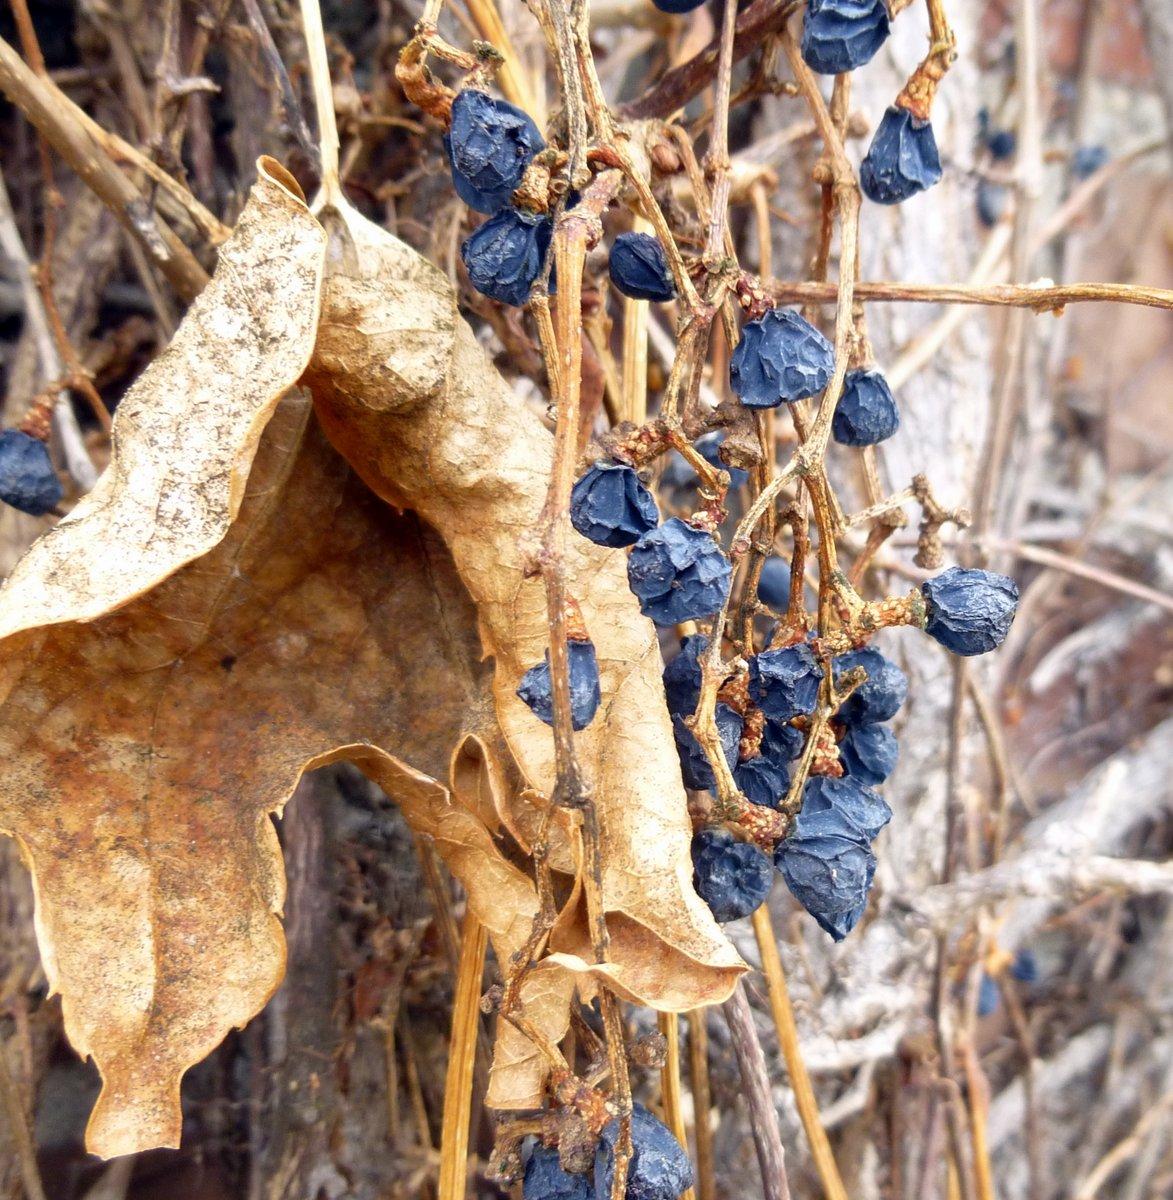 3. Boston Ivy Berries